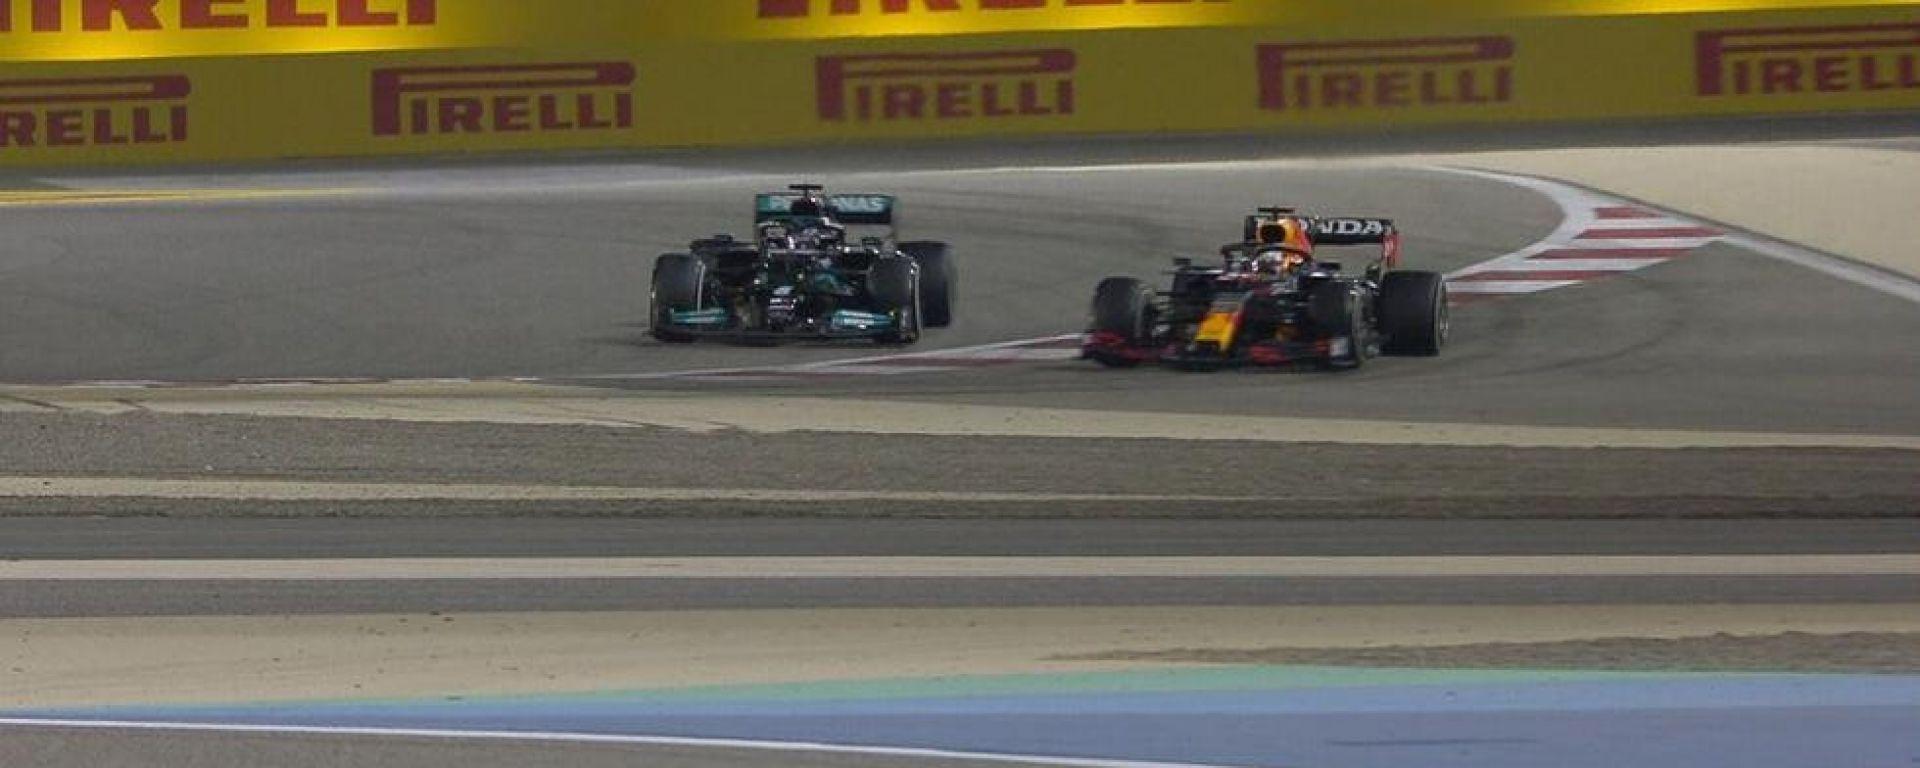 F1 GP Bahrain 2021, Sakhir: il sorpasso di Verstappen su Hamilton